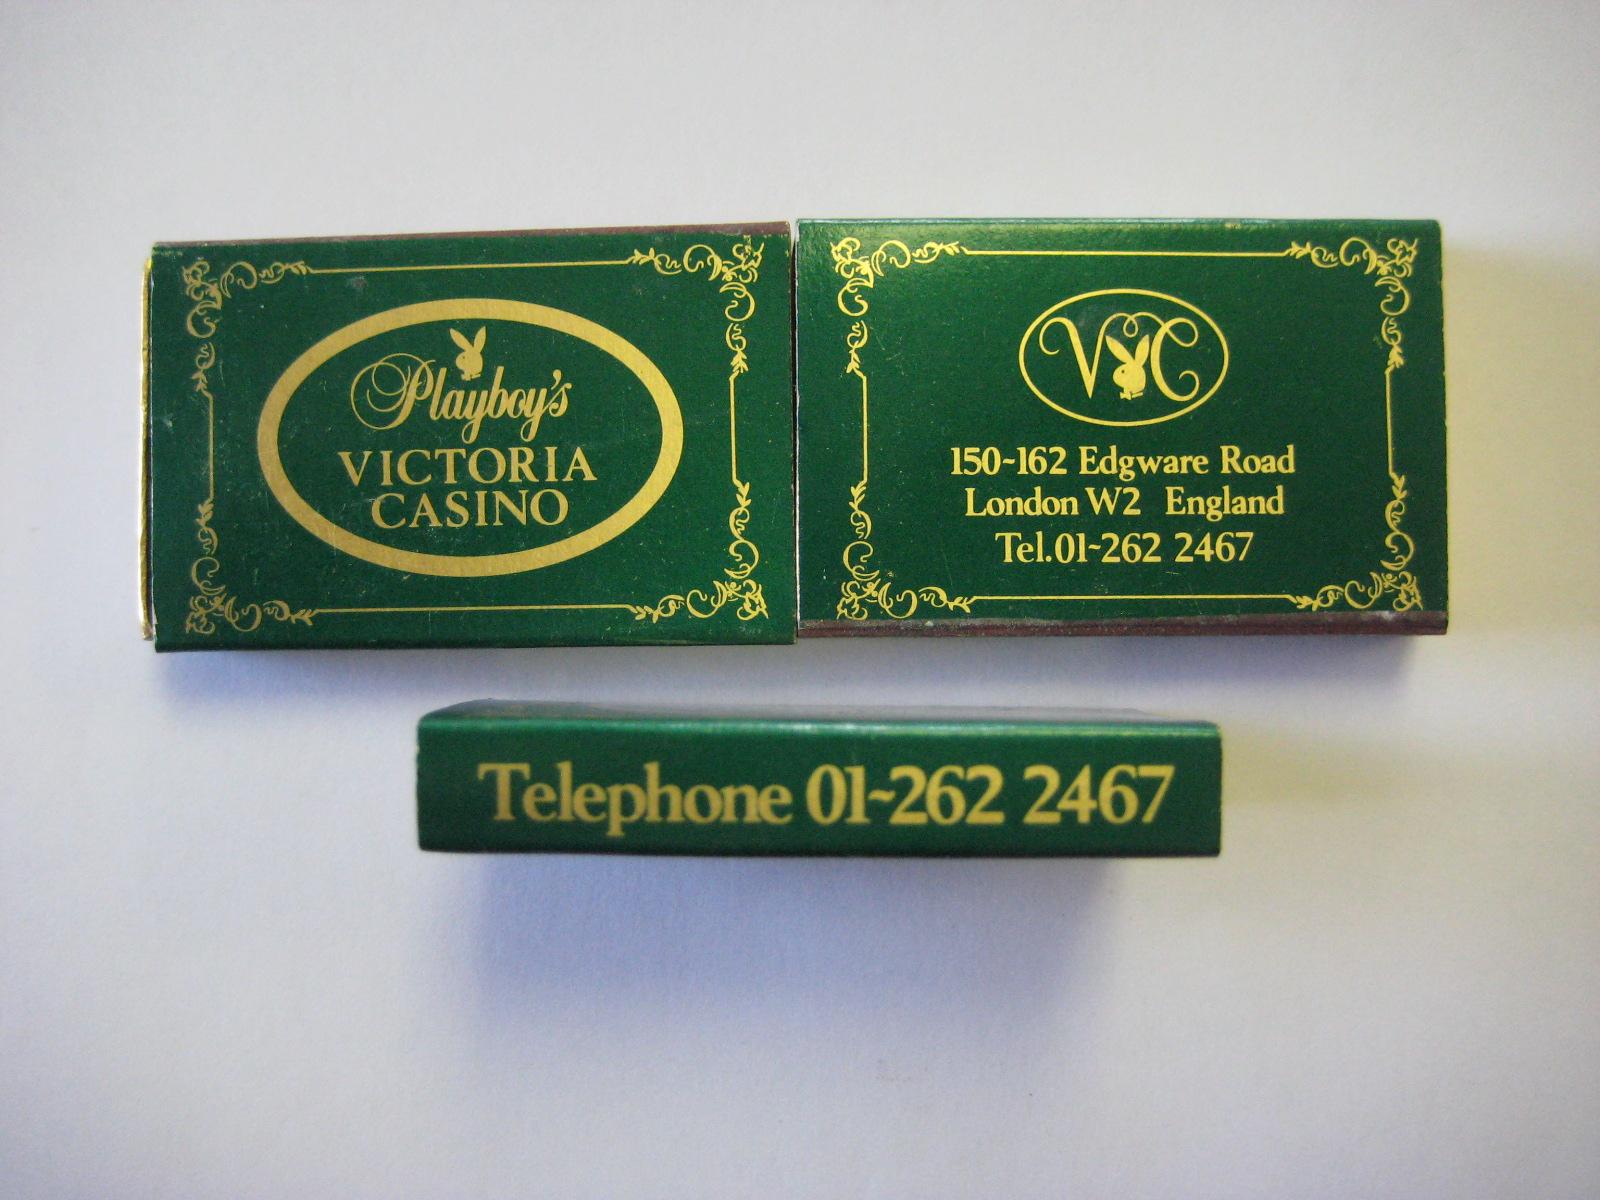 Playboy's Victoria Casino Matches